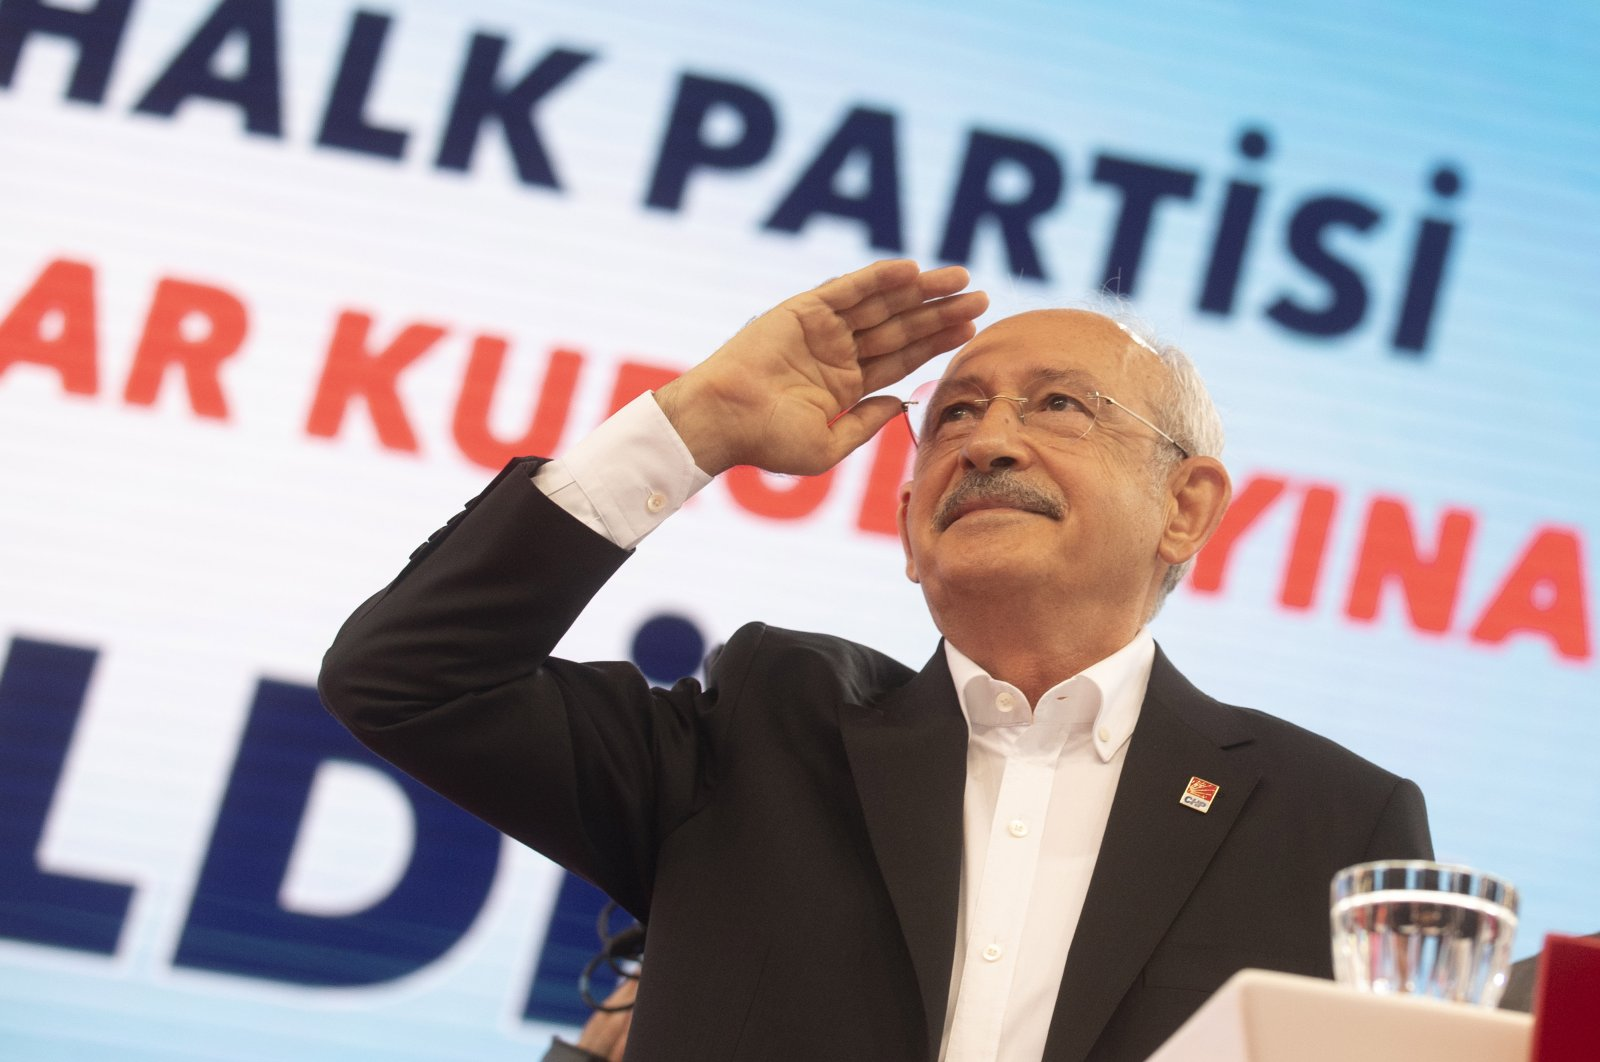 CHP head Kemal Kılıçdaroğlu salutes party members during 37th ordinary meeting of the party, July 25, 2020. (Photo by Ali Ekeyılmaz)